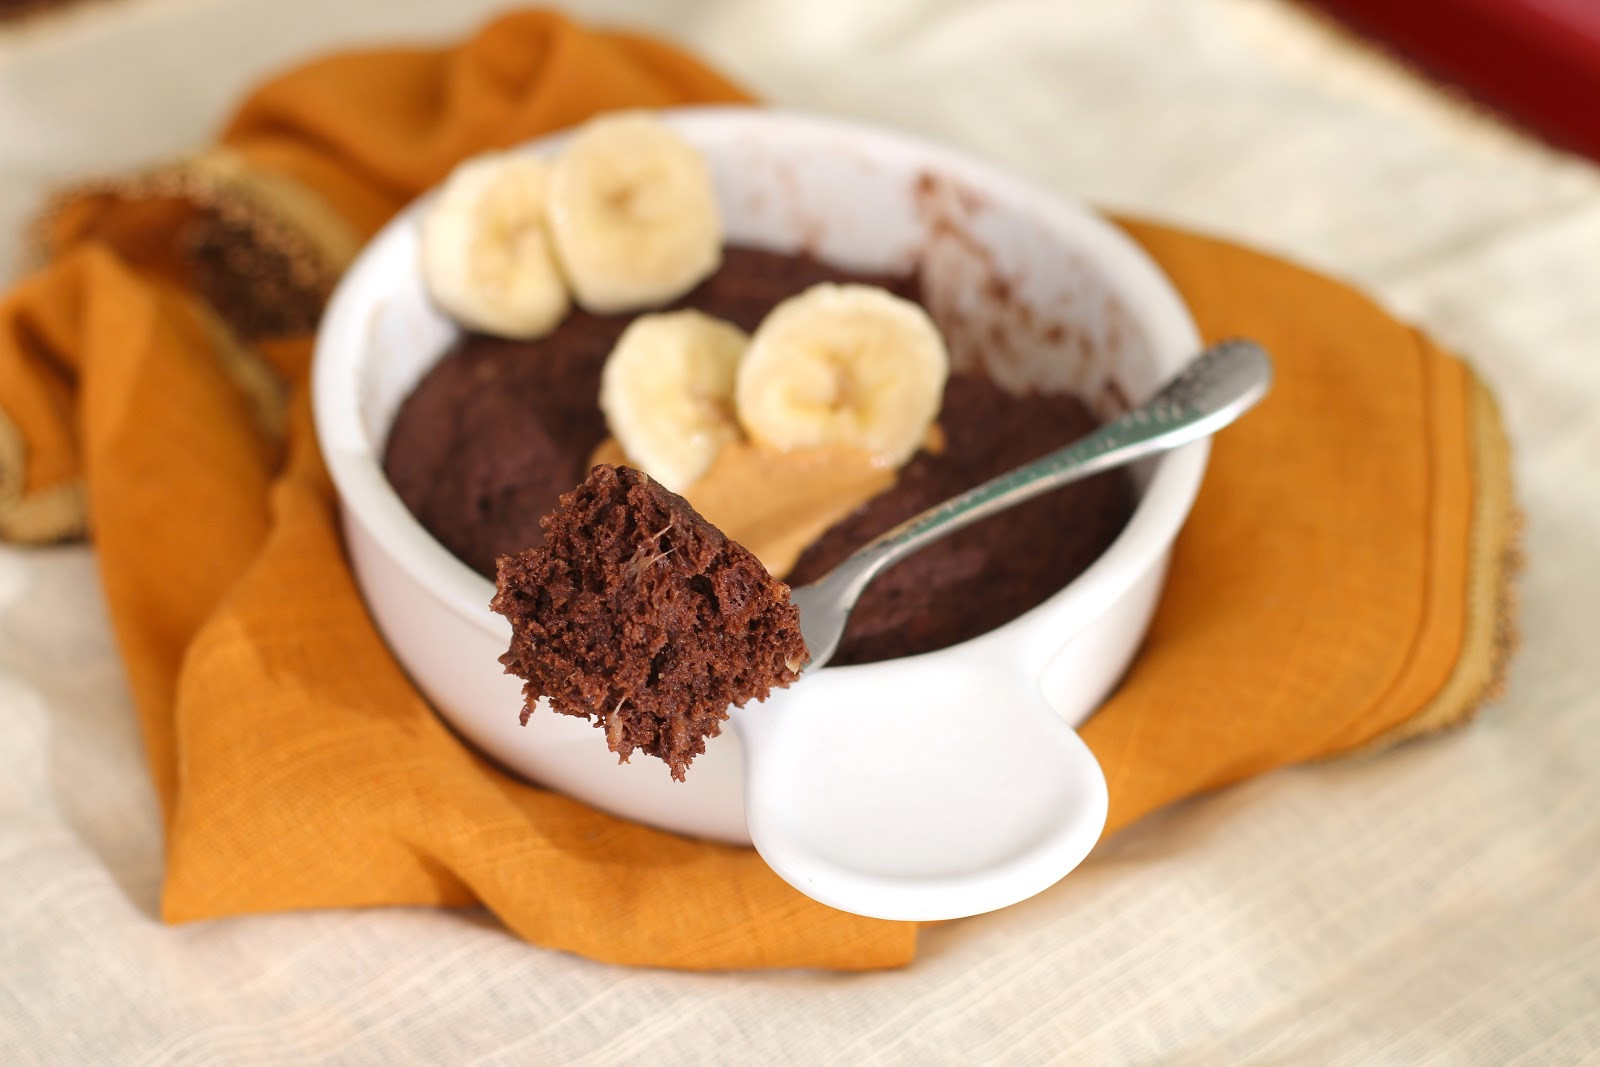 Healthy Banana Desserts  Healthy Single Serving Chocolate Peanut Butter Banana